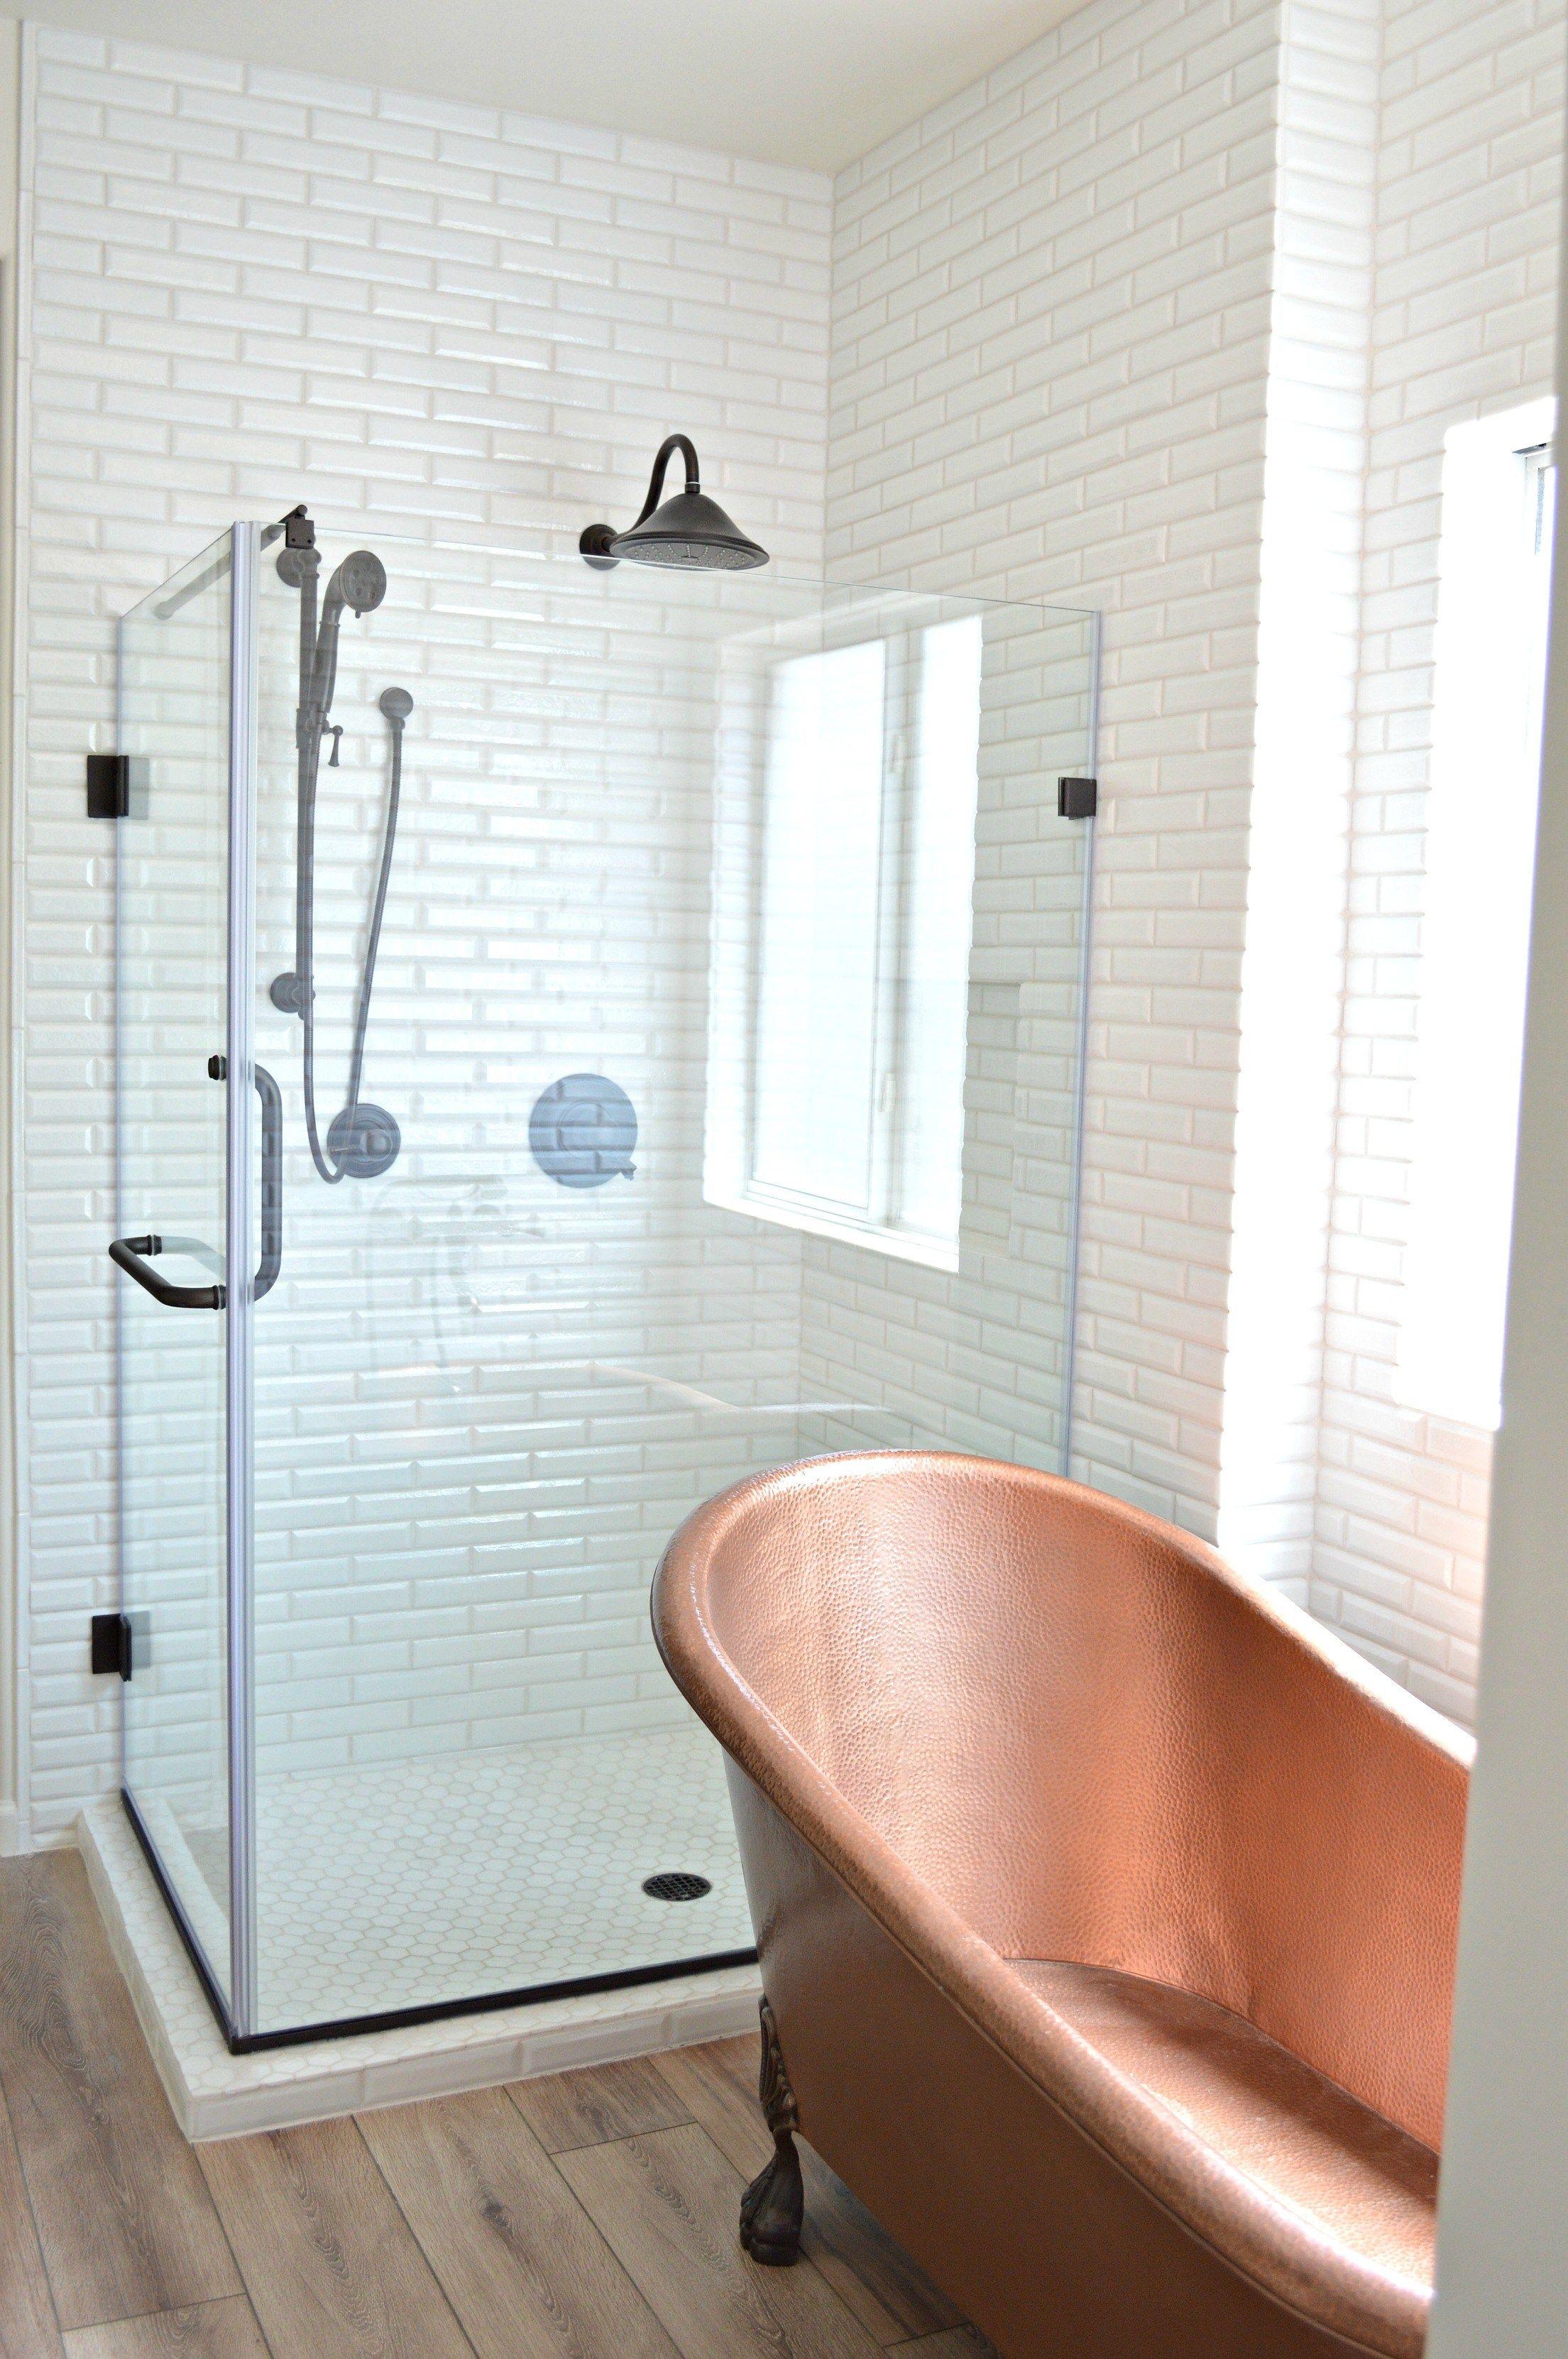 Our Master Bathroom Reveal | Bathroom Design Ideas | Pinterest ...